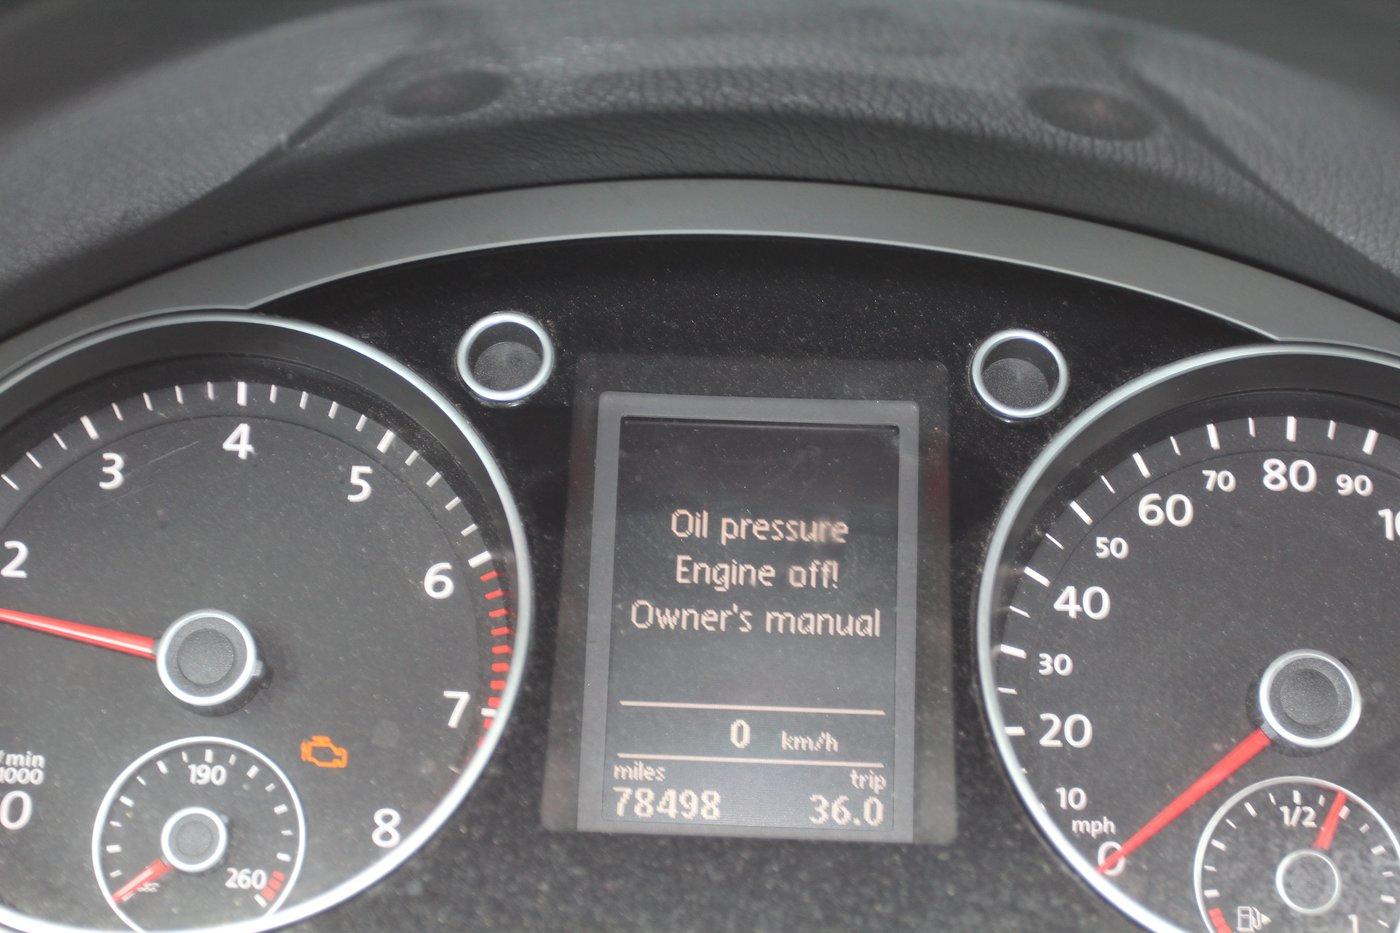 oil-pressure-warning-vw-volkswagen-cc-tsi-2-liter-ccta-engine